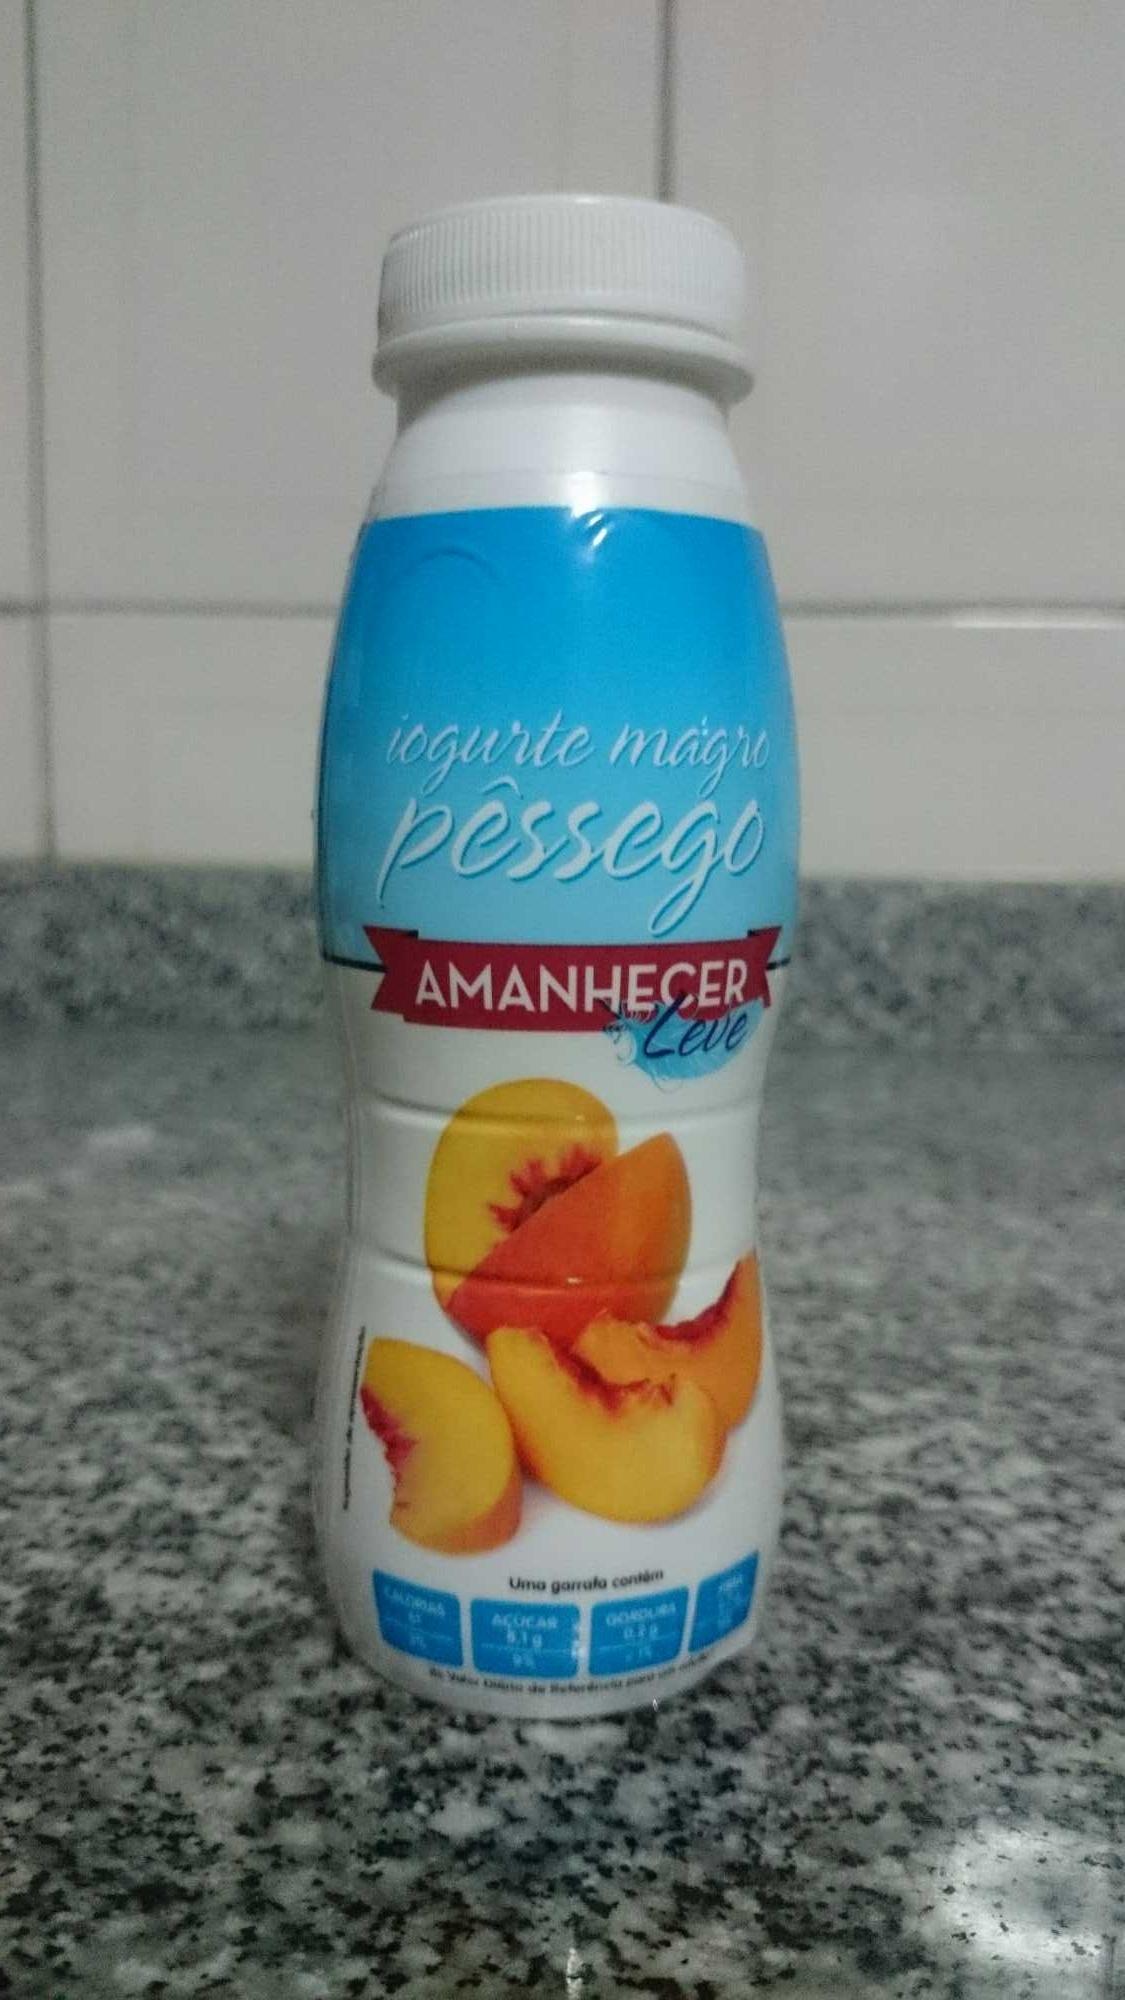 Iogurte magro pêssego - Product